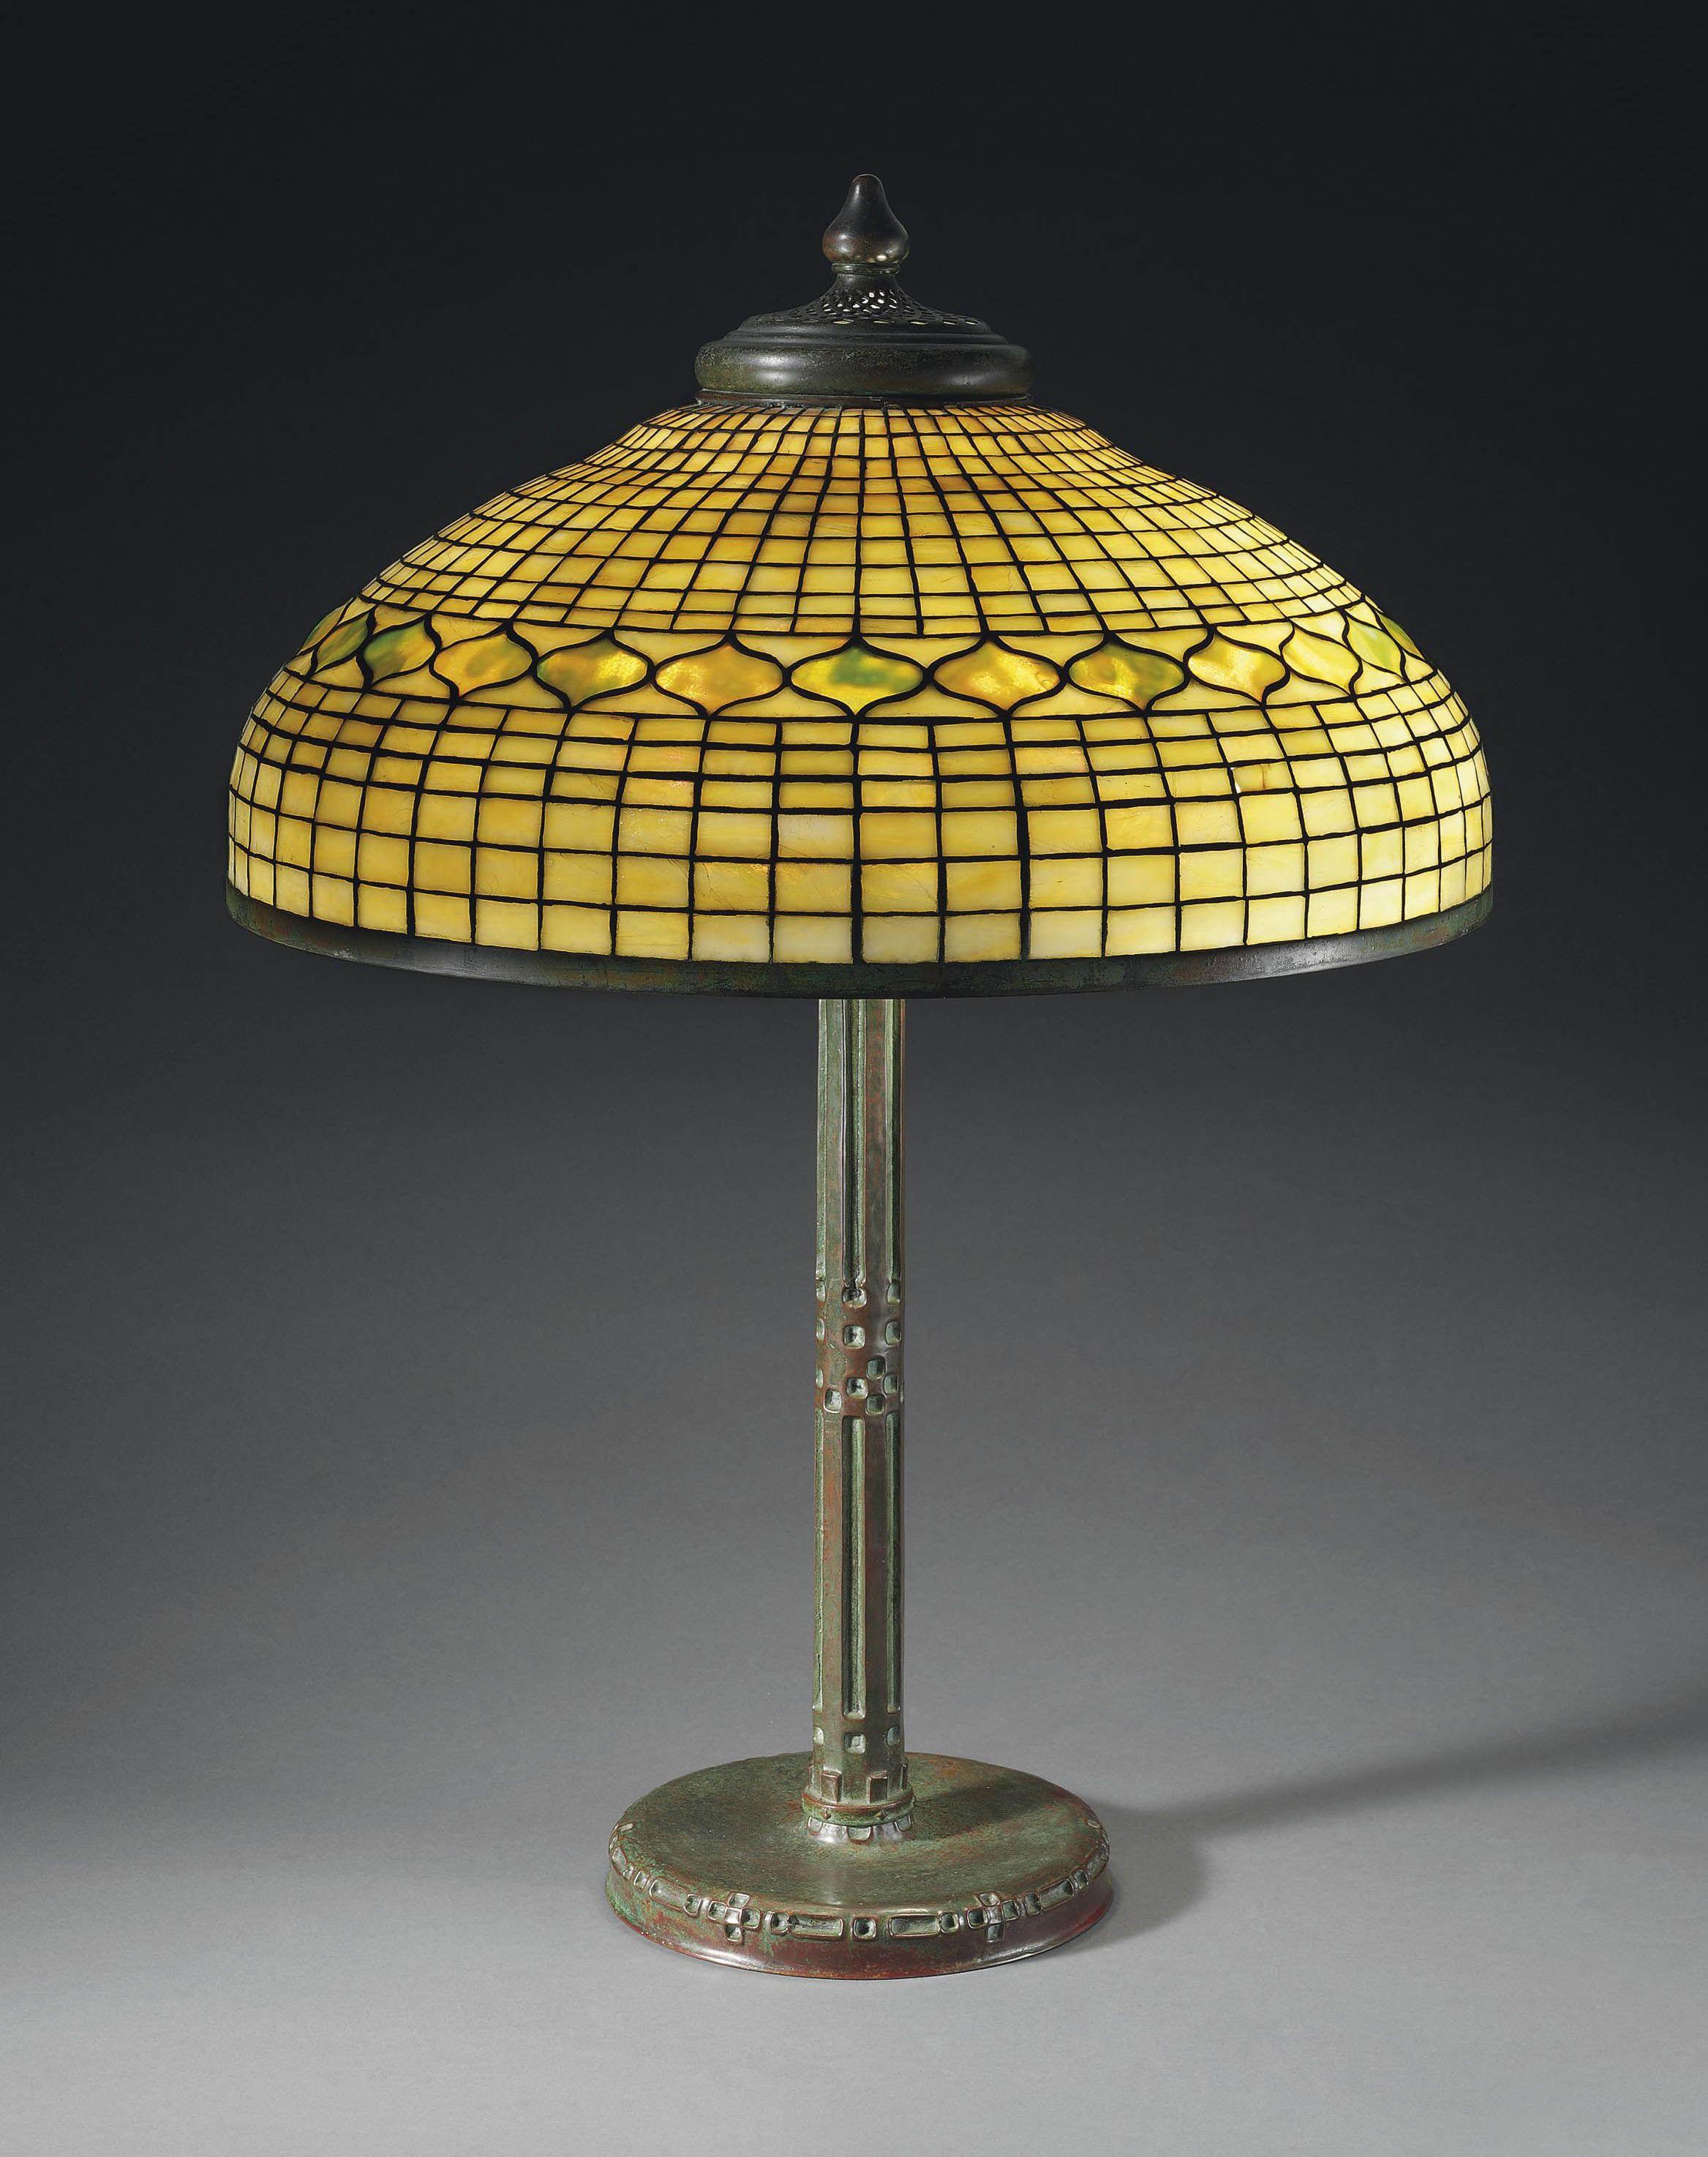 Tiffany Studios A Vine Border Leaded Glass And Bronze Table Lamp Circa 1910